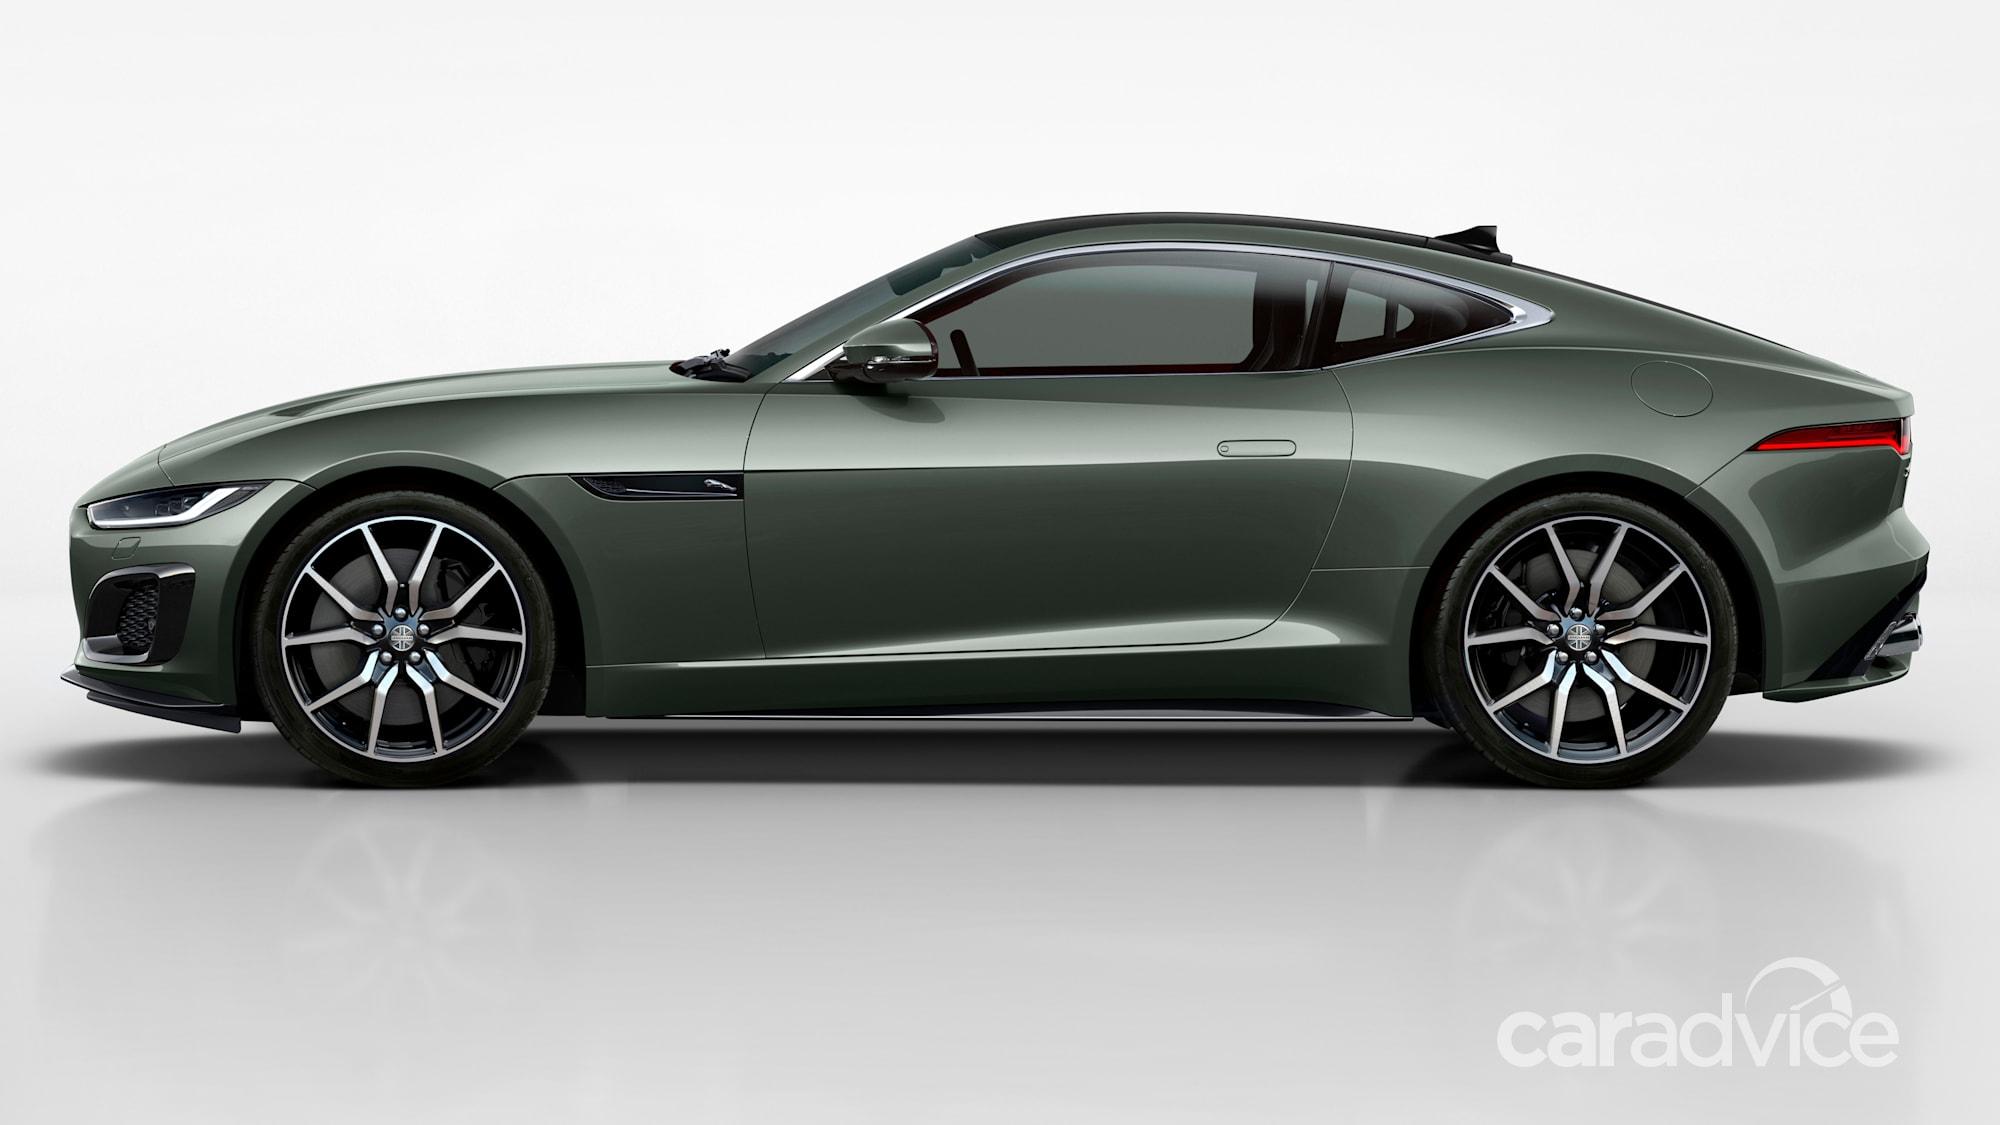 2021 Jaguar F-Type Heritage 60 Edition price and specs ...